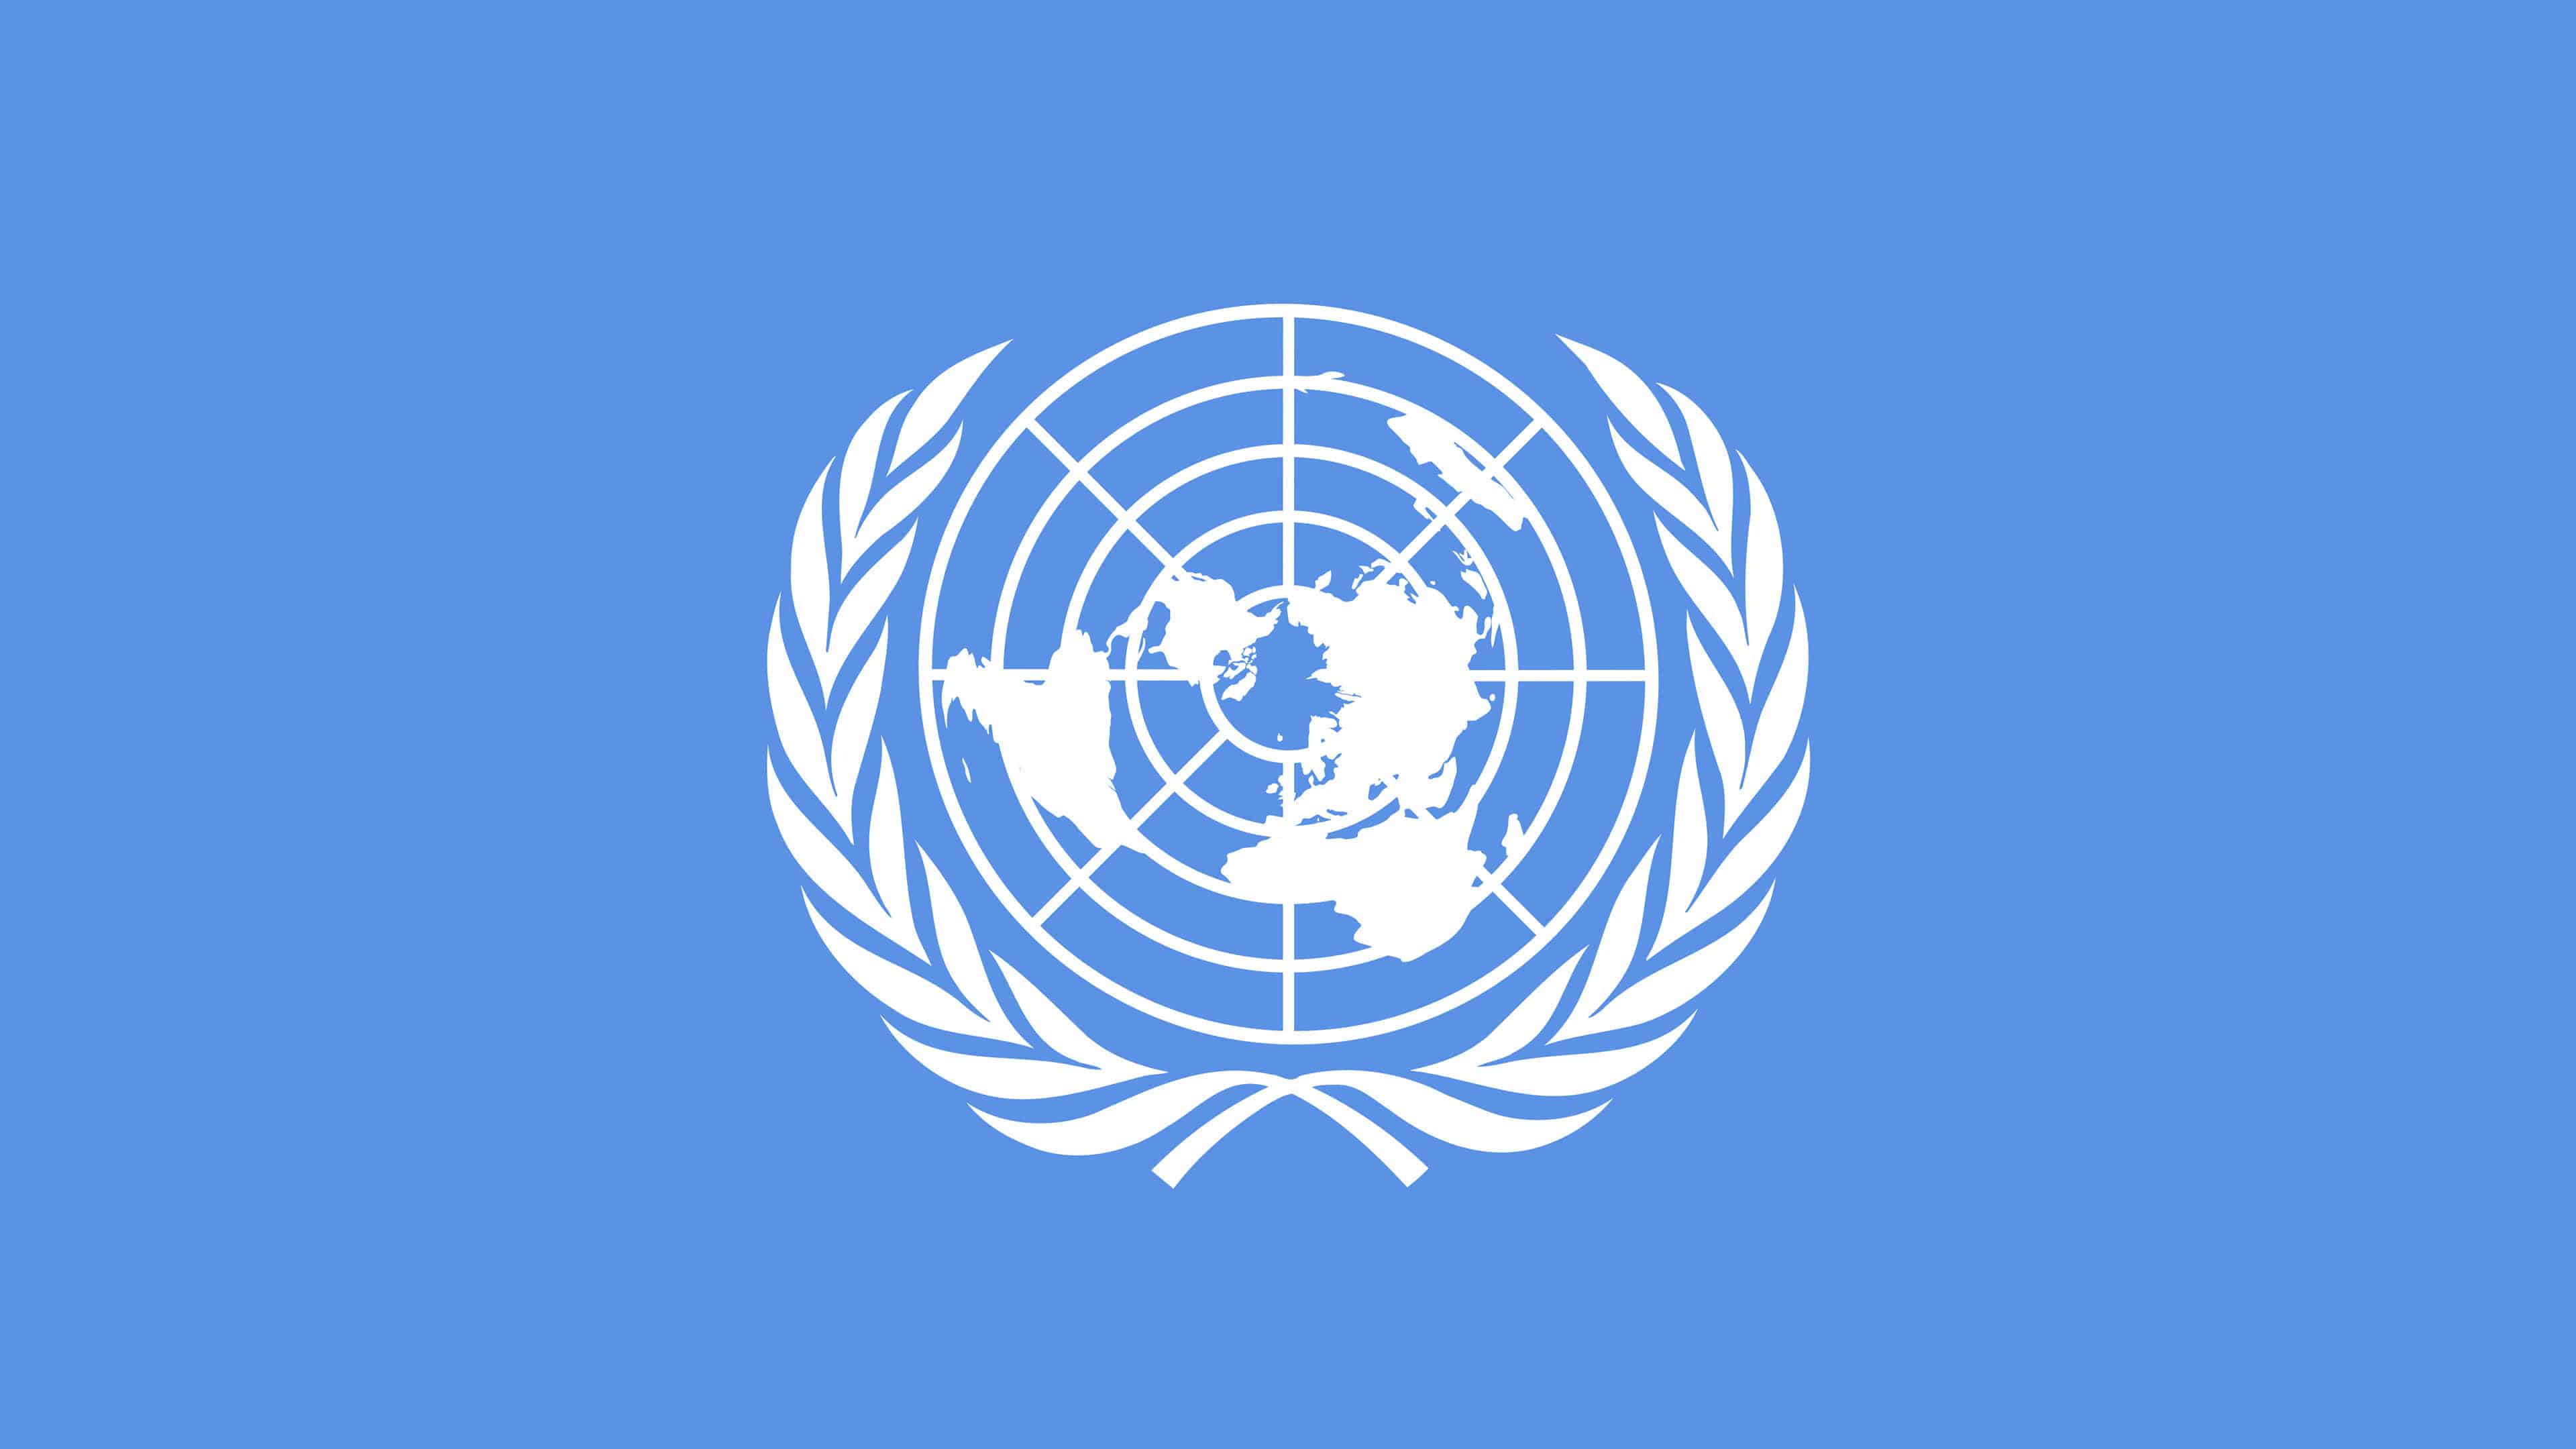 United Nations Logo UHD 4K Wallpaper Pixelz 3840x2160